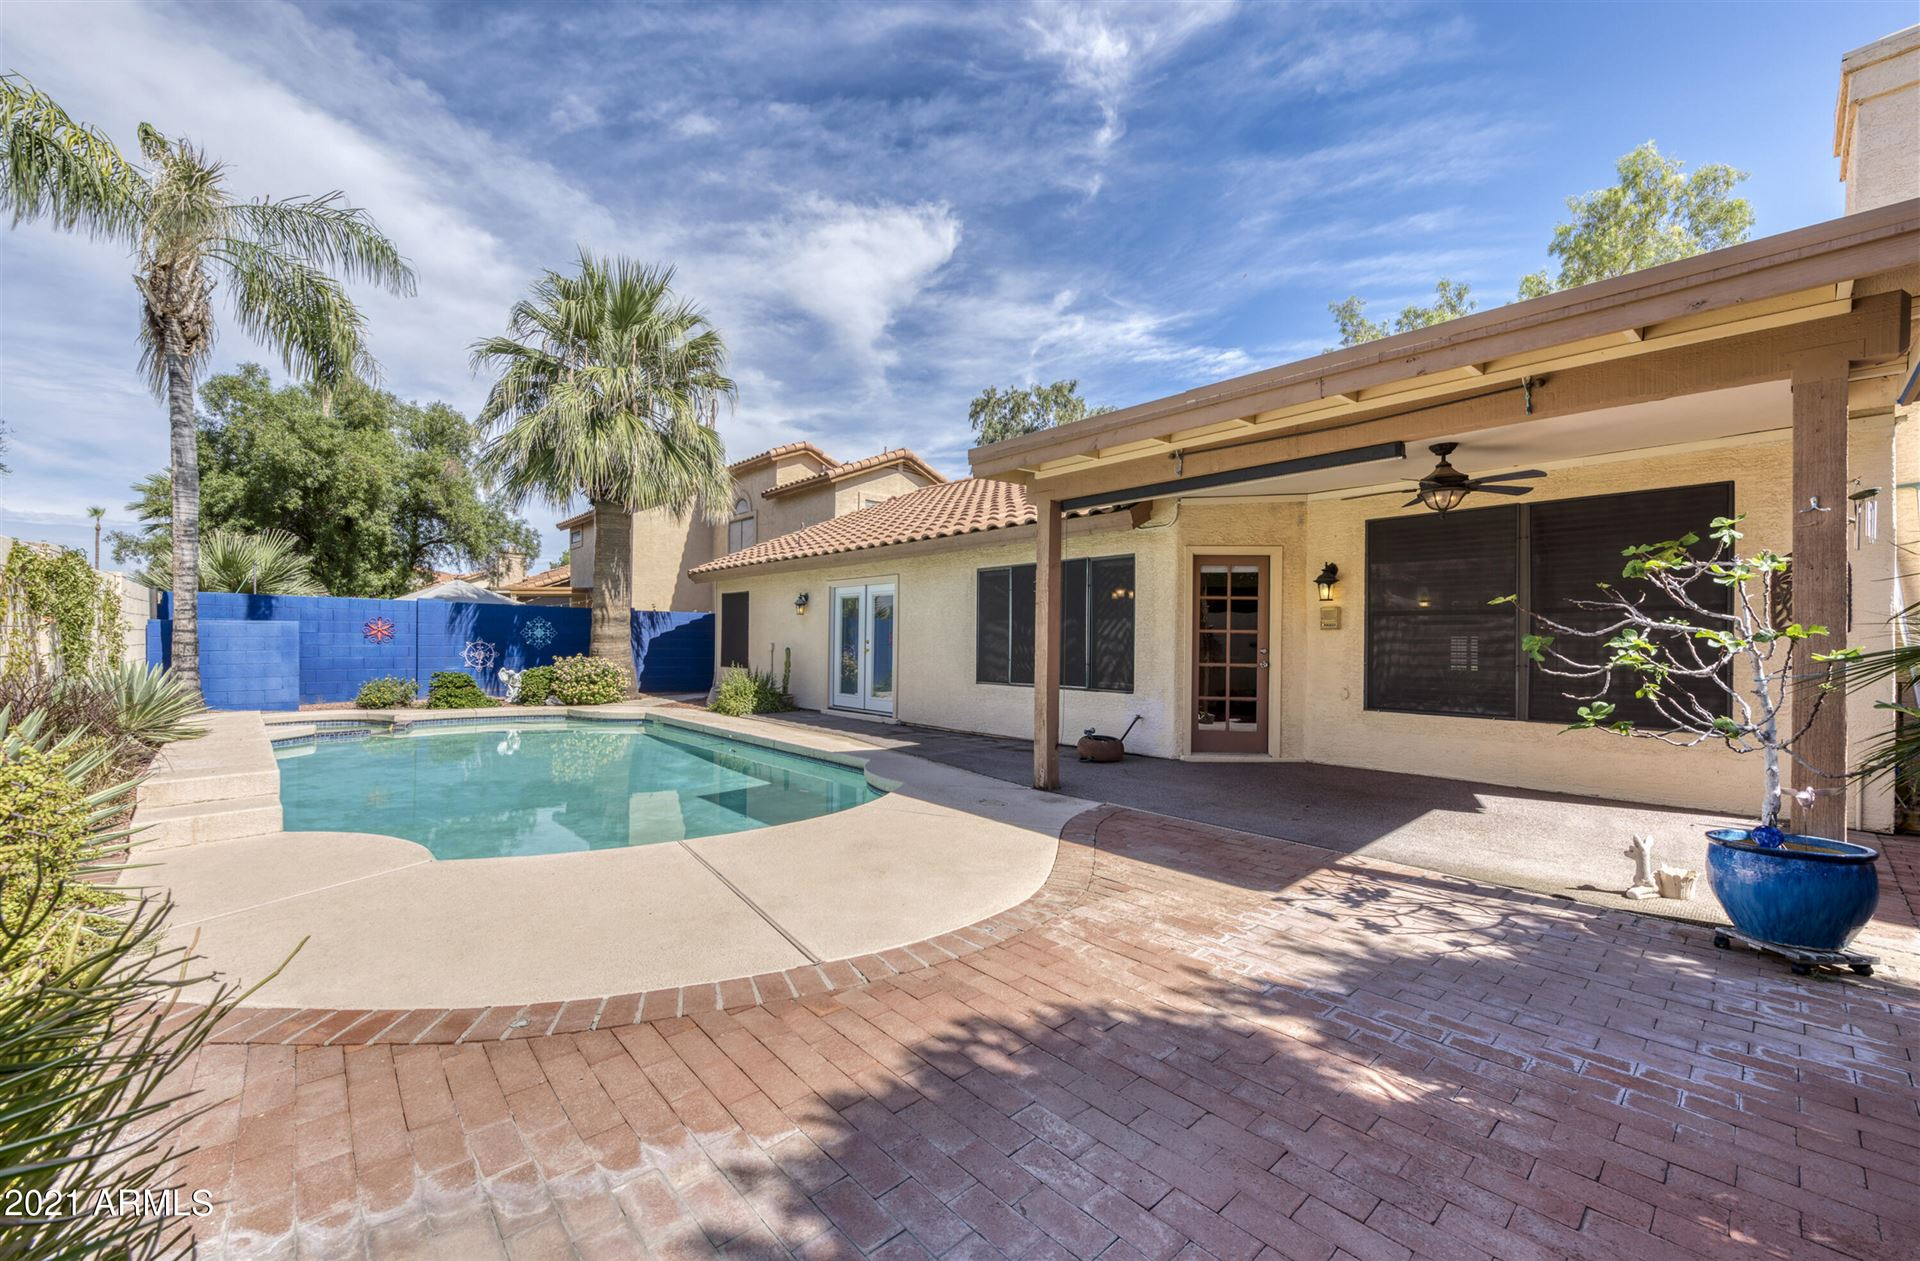 Photo of 9510 S DROMEDARY Drive, Tempe, AZ 85284 (MLS # 6306265)